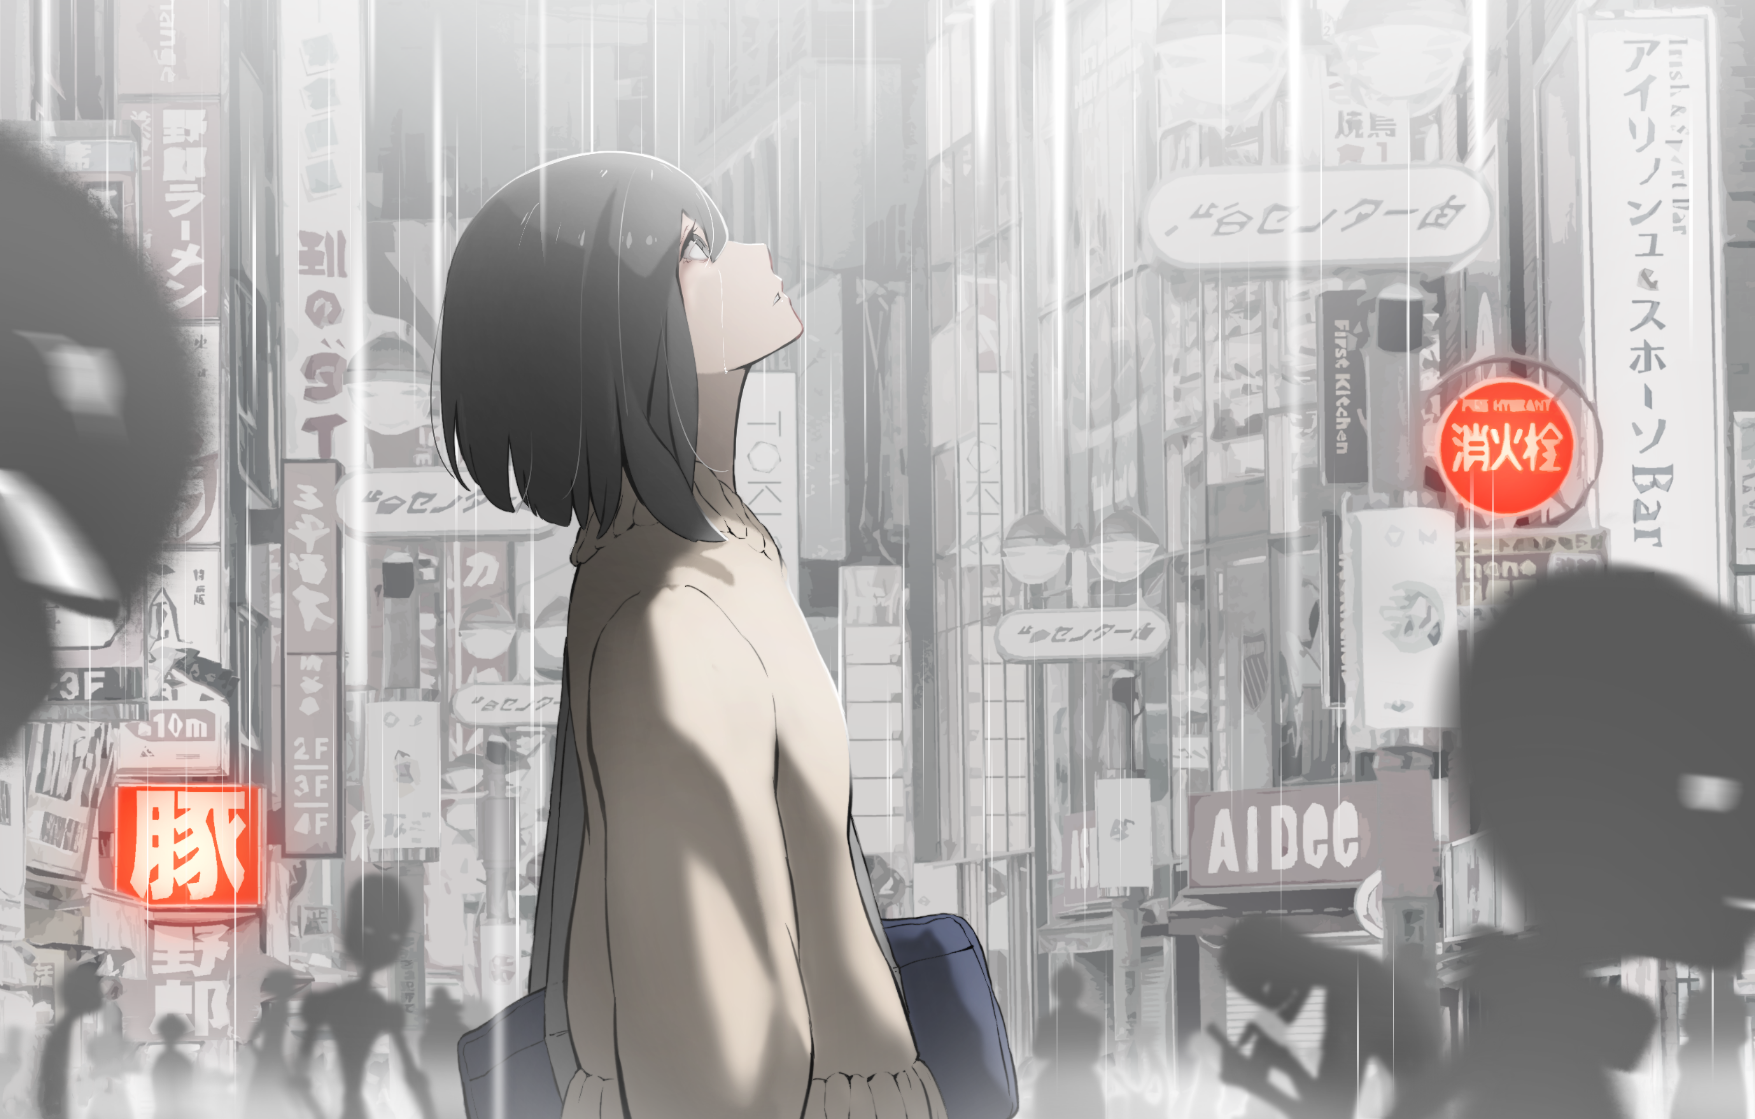 Anime 1755x1119 alone Japan street anime girls anime city sign looking up dark hair rain Hoshizaki Reita